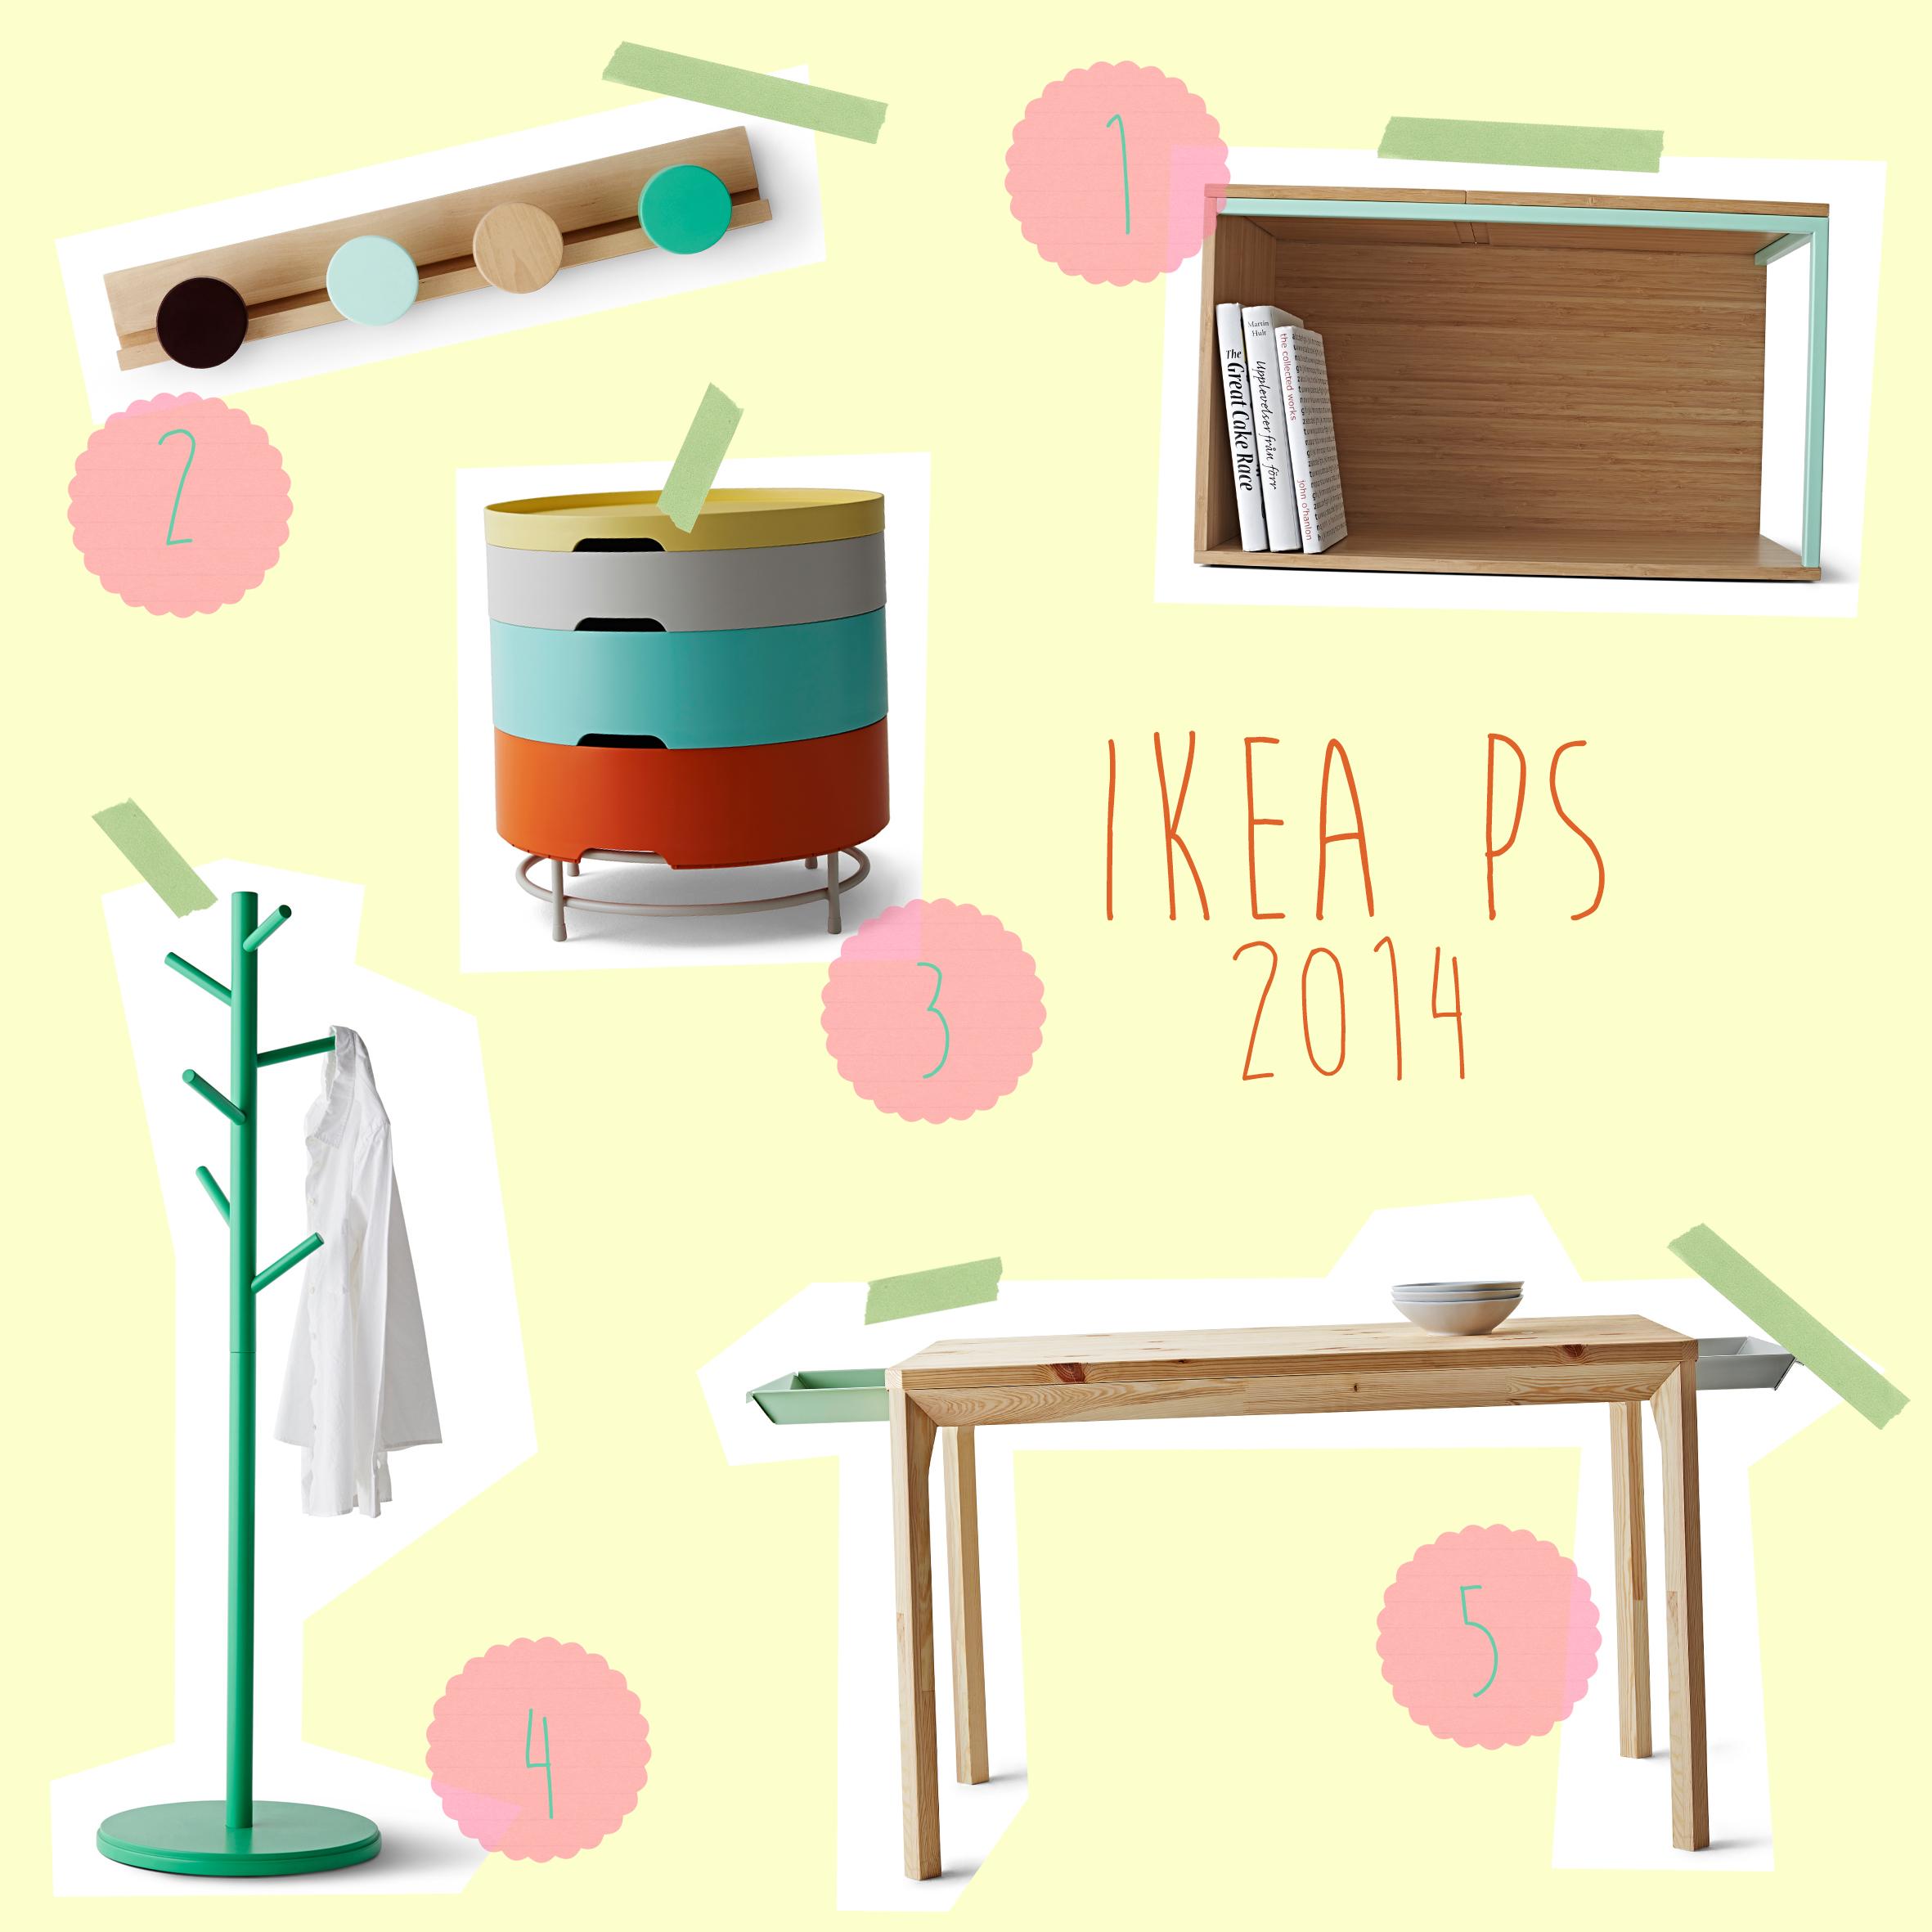 viel unter der haube ikea ps 2014. Black Bedroom Furniture Sets. Home Design Ideas